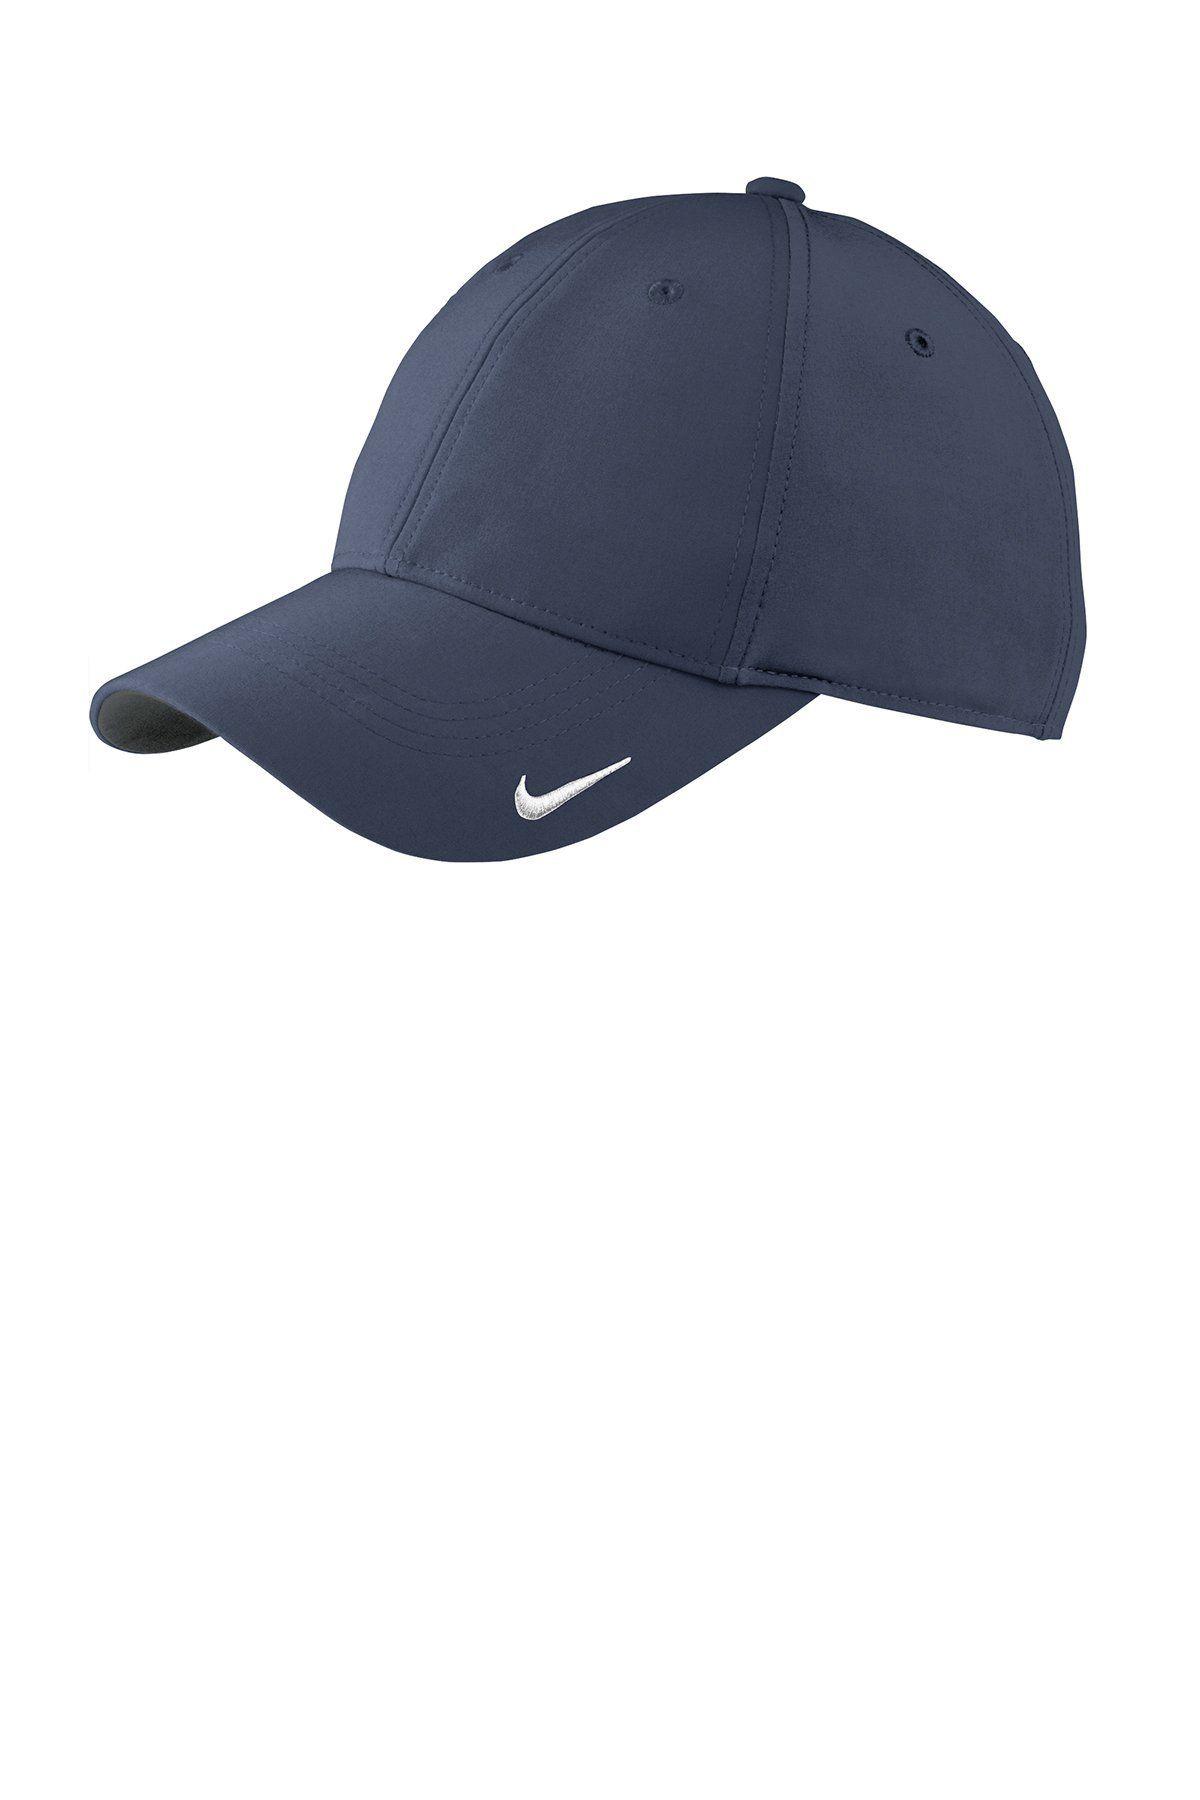 b688267f661 Nike Swoosh Legacy 91 Cap 779797 Navy  Navy. Nike Swoosh Legacy 91 Cap  779797 Navy  Navy Legacy Hats